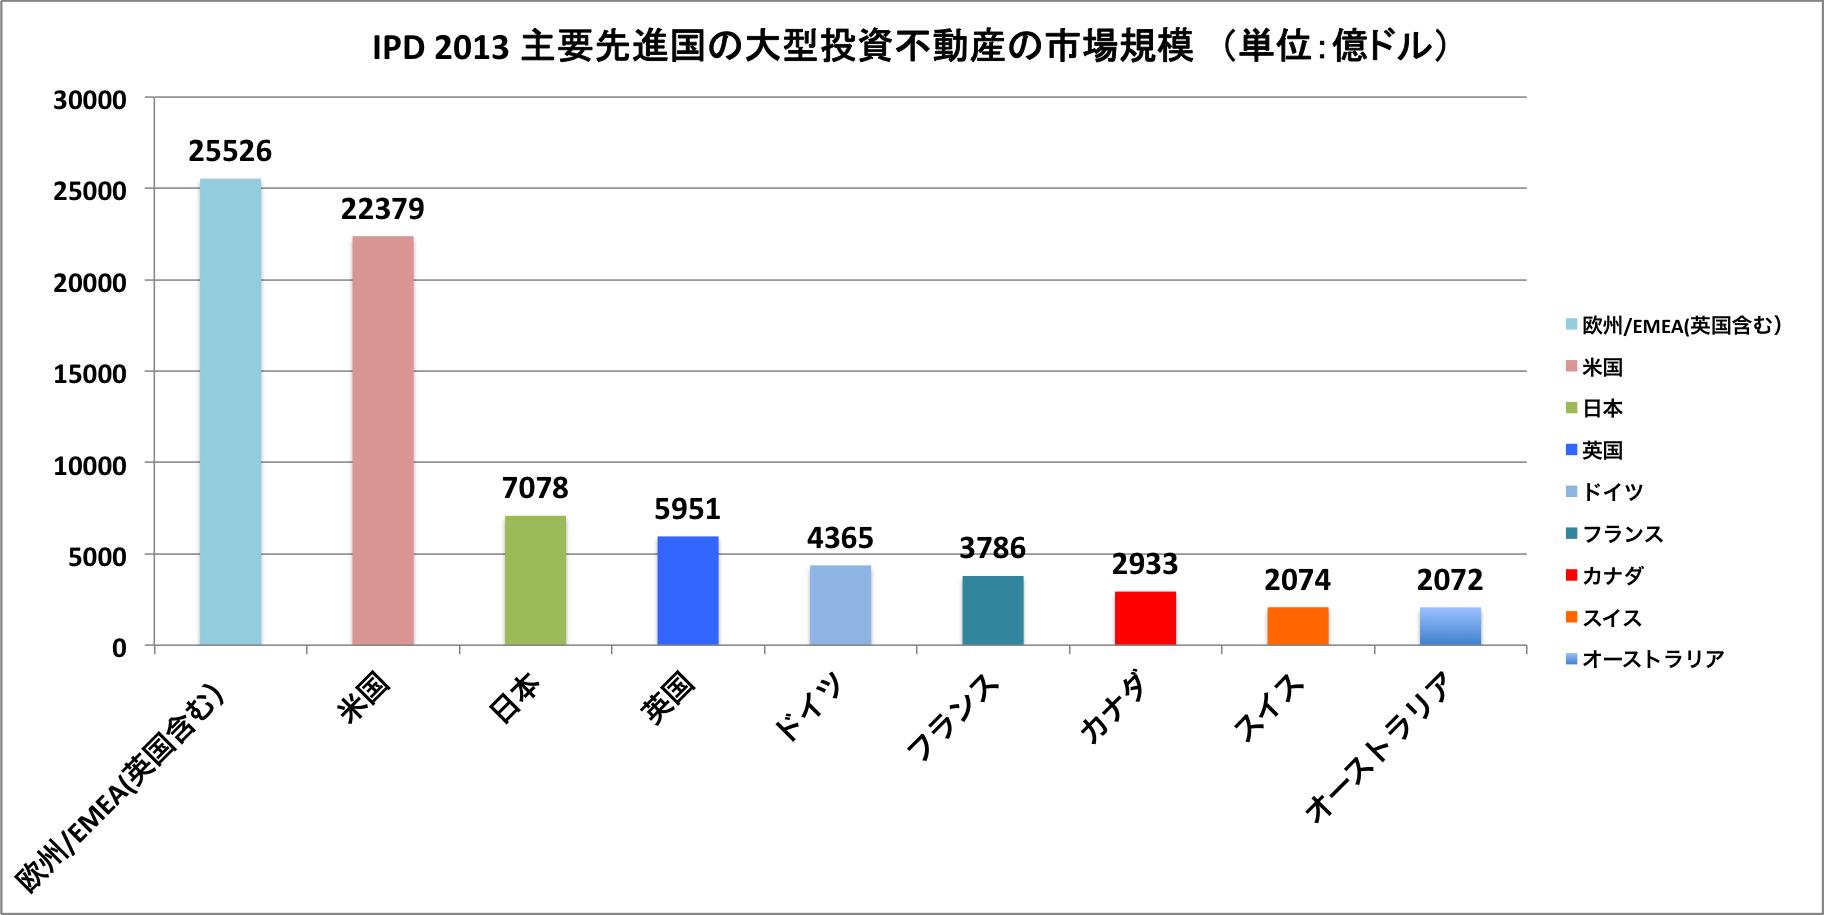 IPD market size 2013